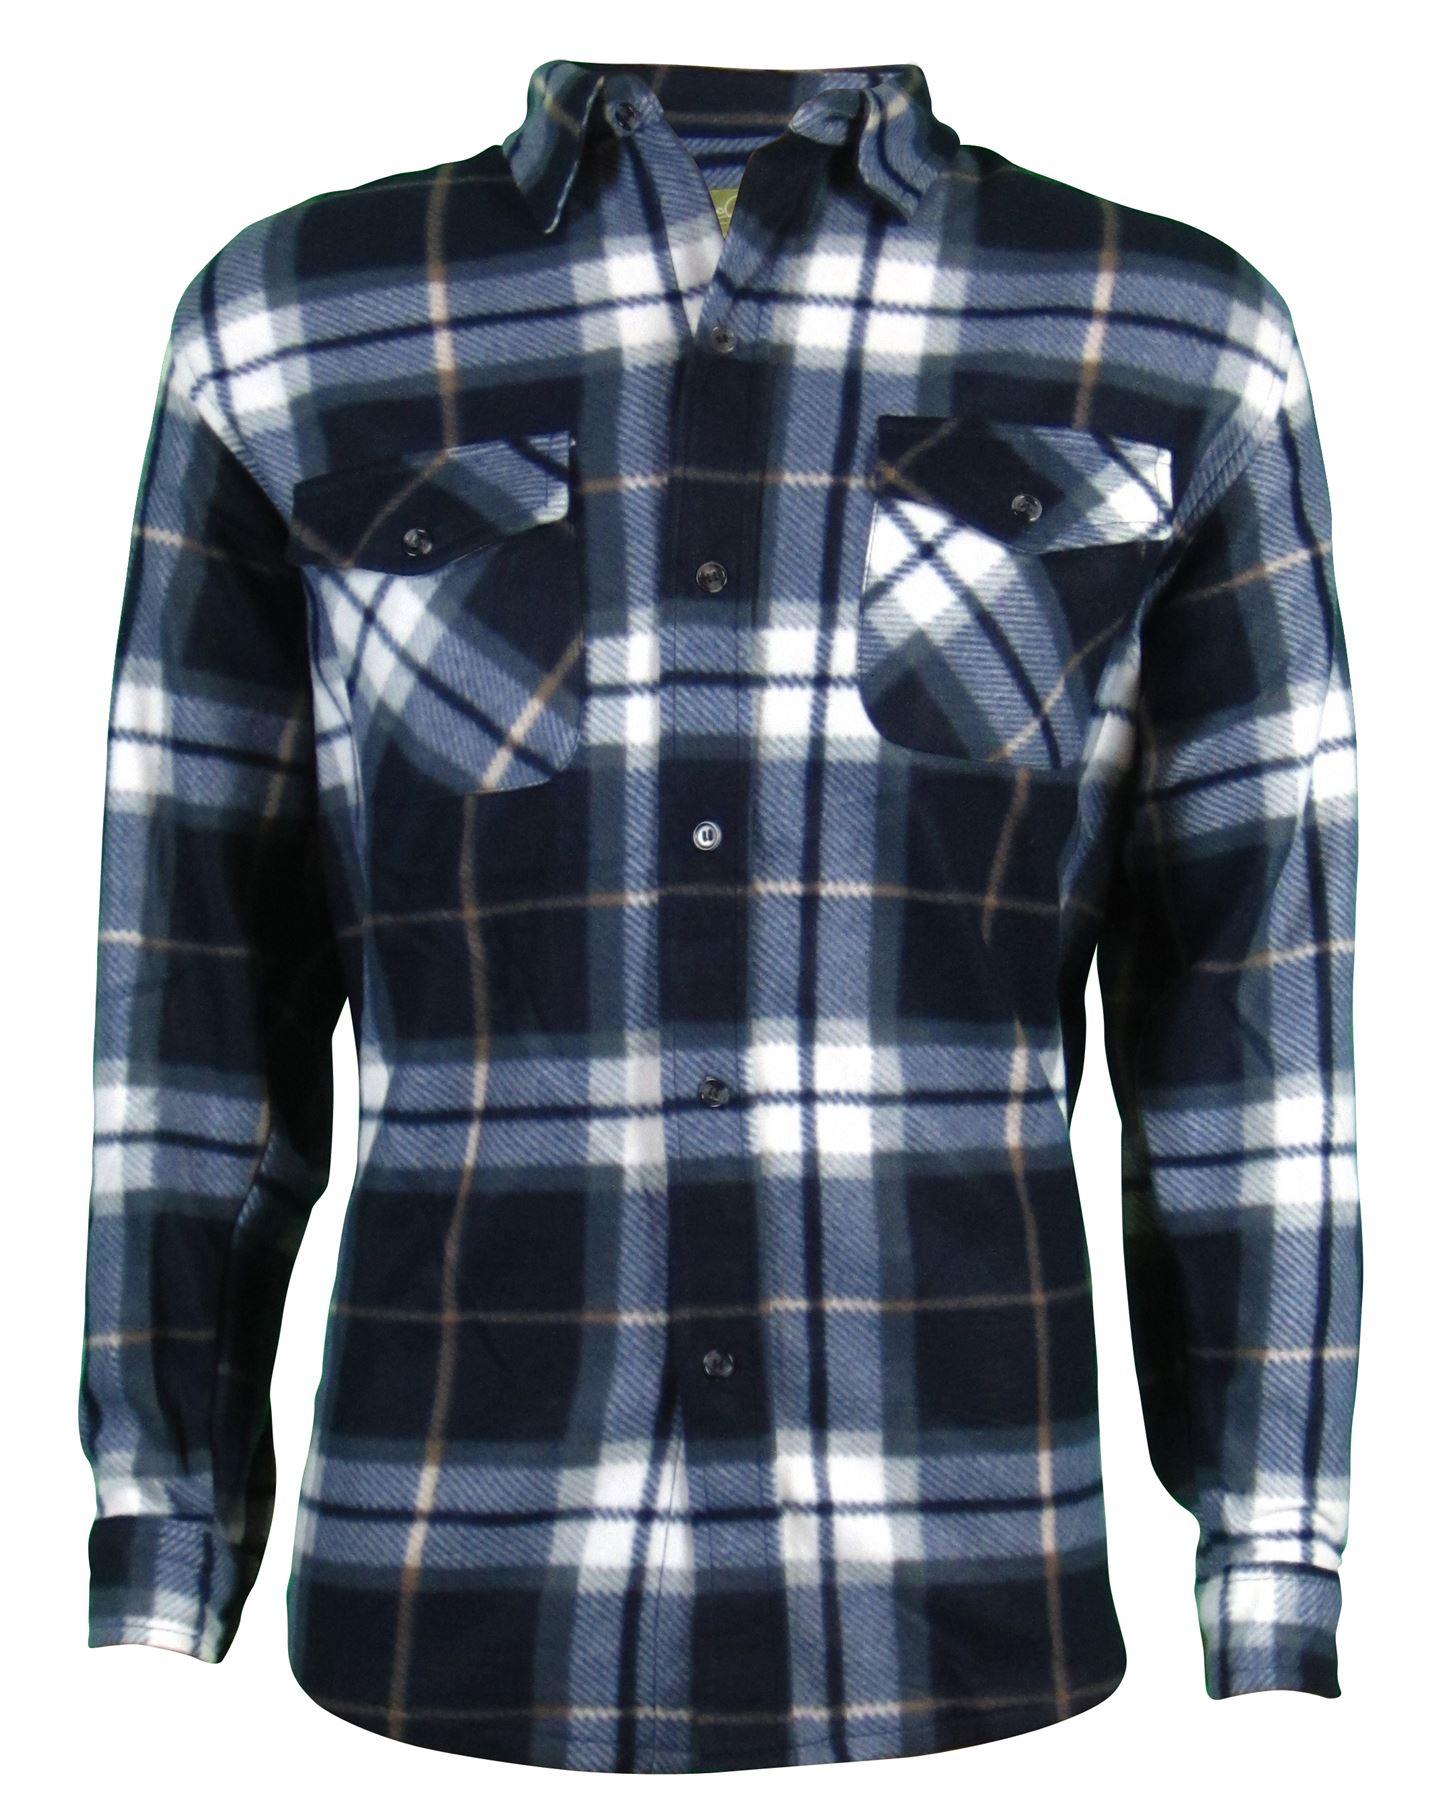 Shirt jacket design - Mens Sherpa Fleece Hooded Lumberjack Check Flannel Fleece